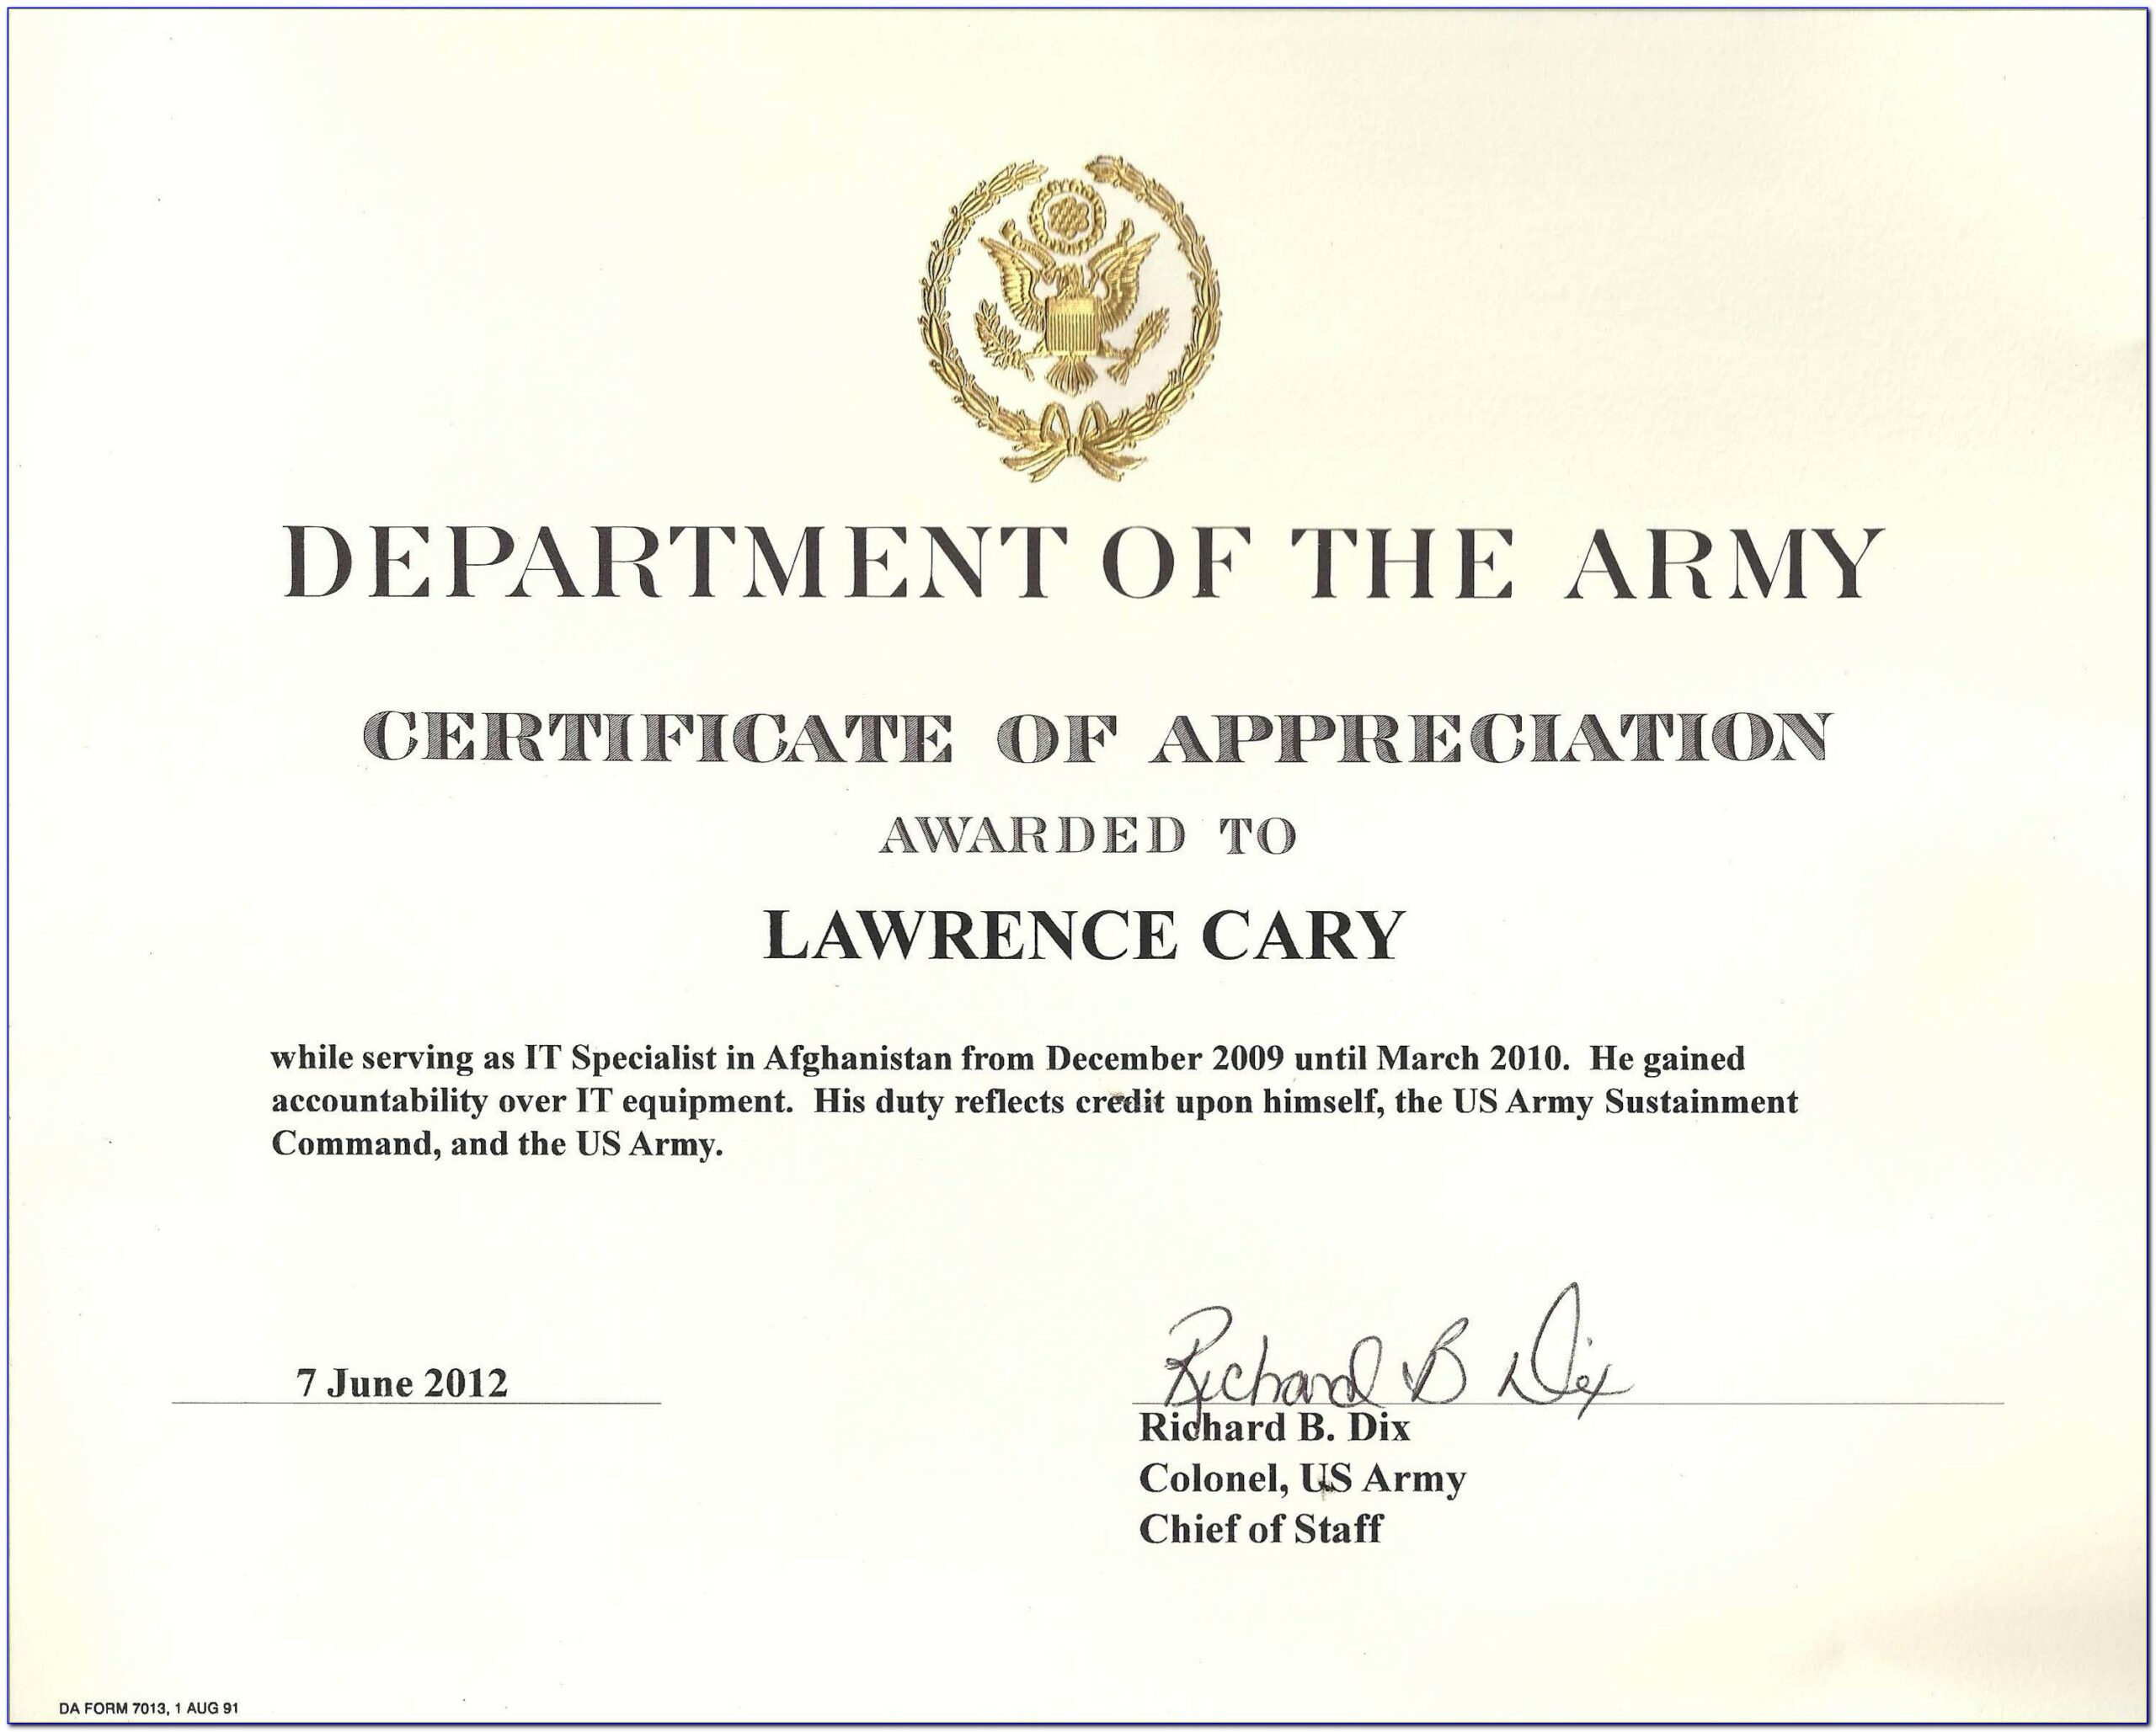 Army Certificates Of Appreciation Templates